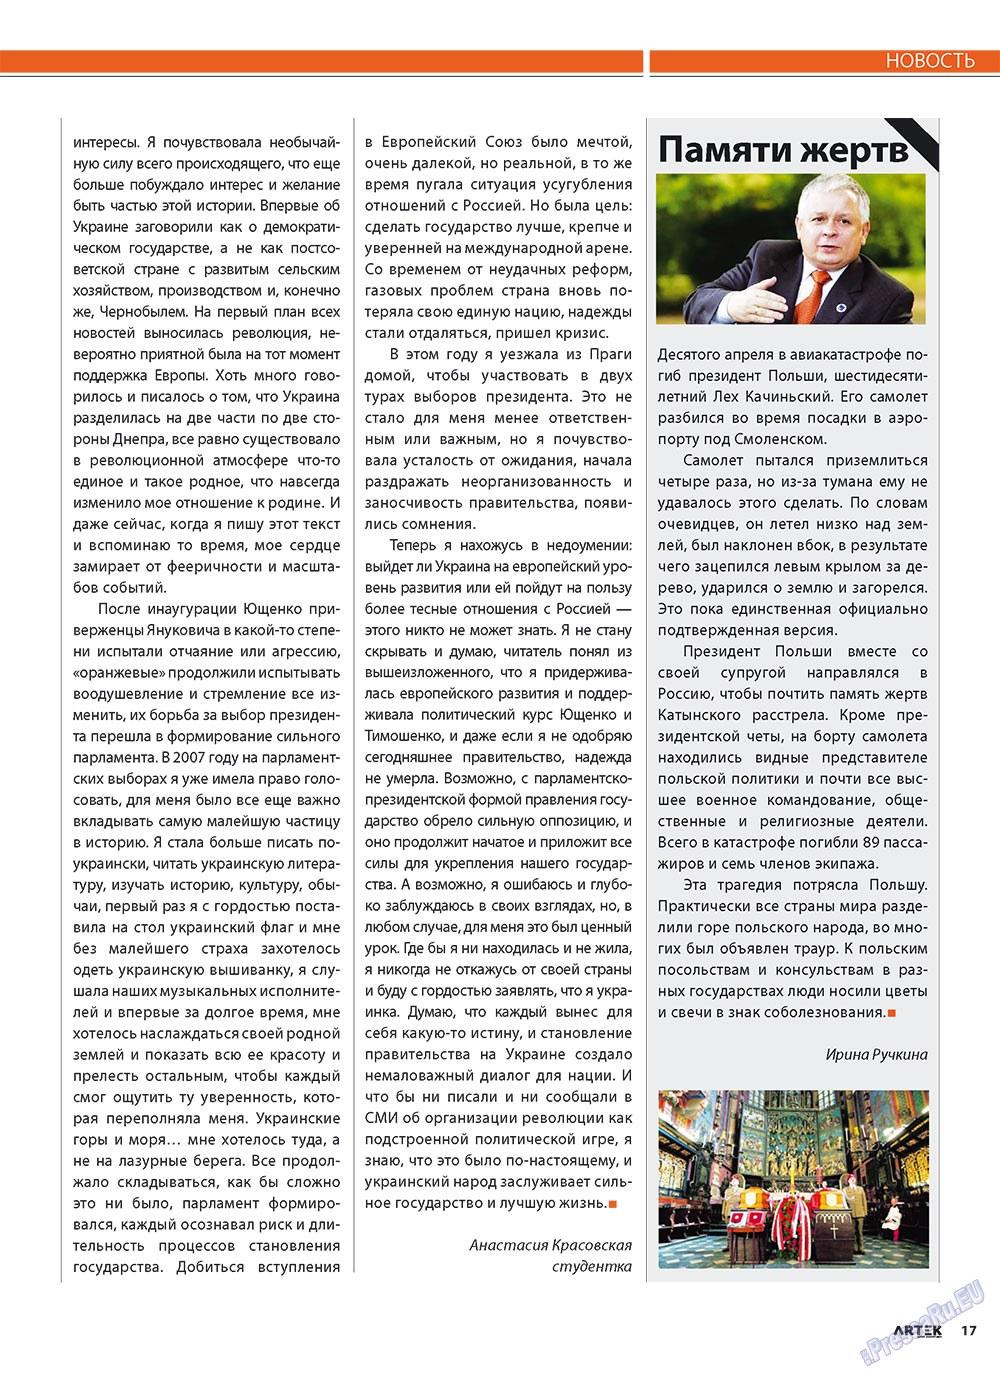 Артек (журнал). 2010 год, номер 2, стр. 19